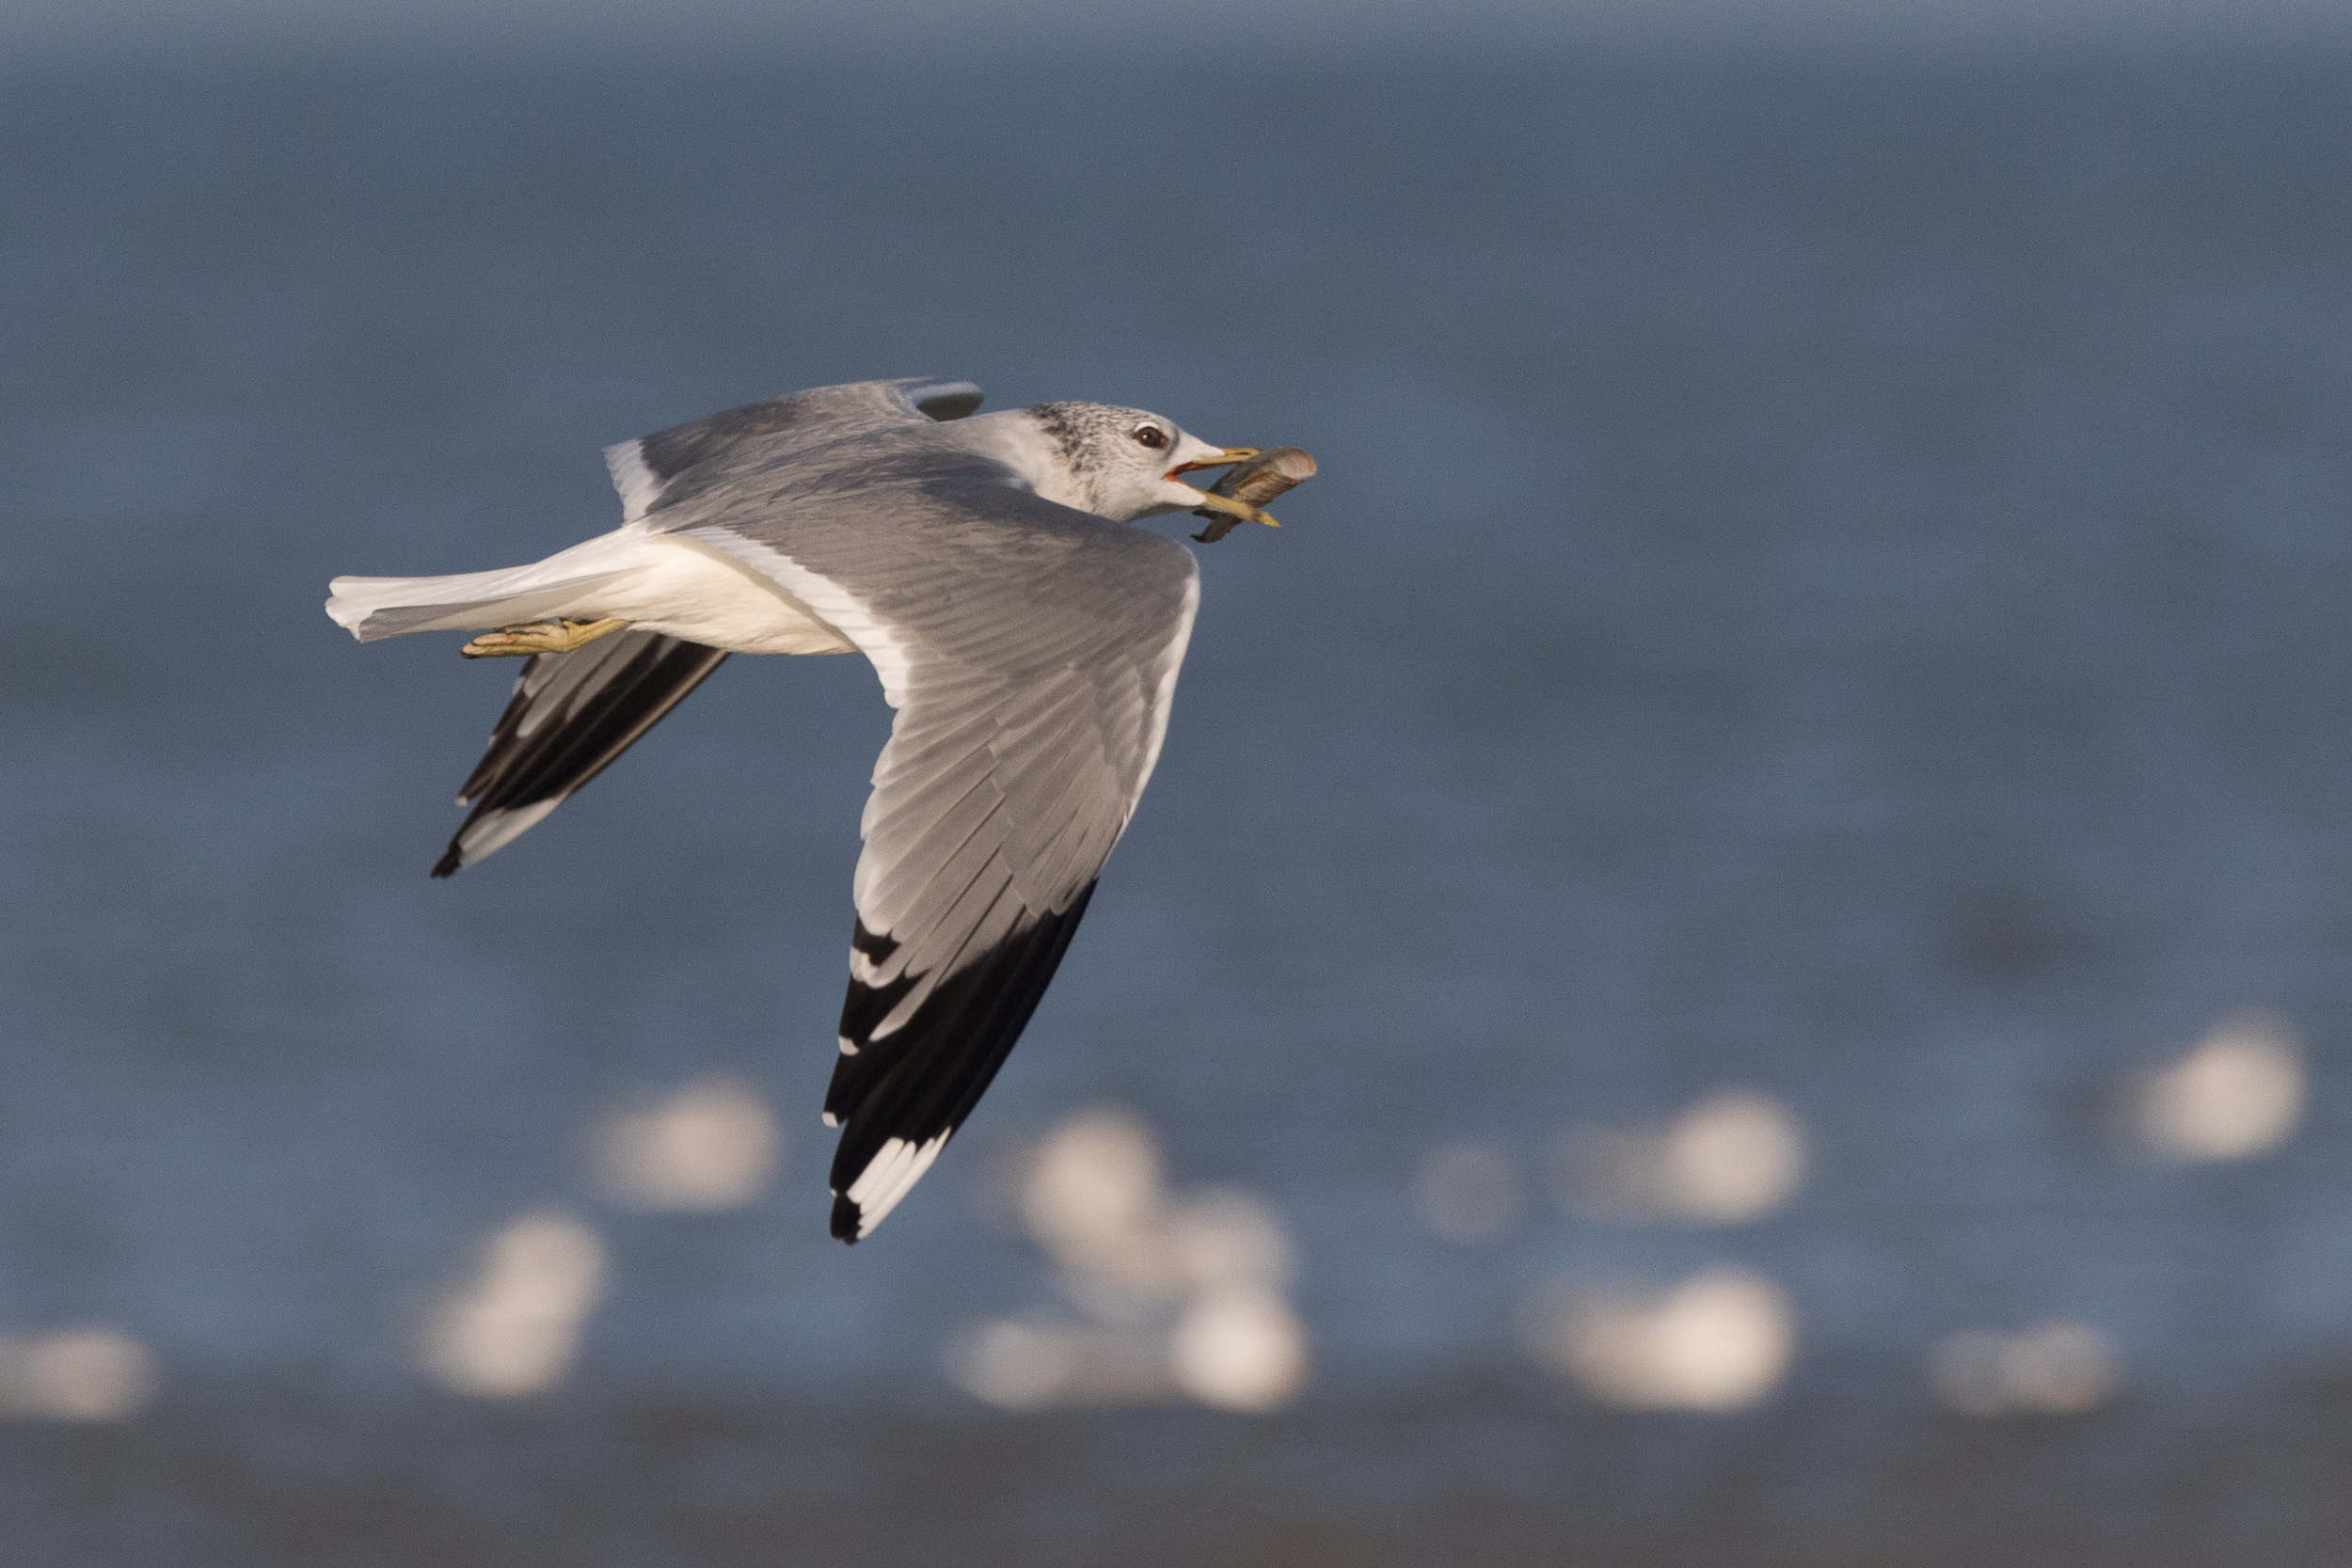 20170121-Common Gull Adult-13.jpg